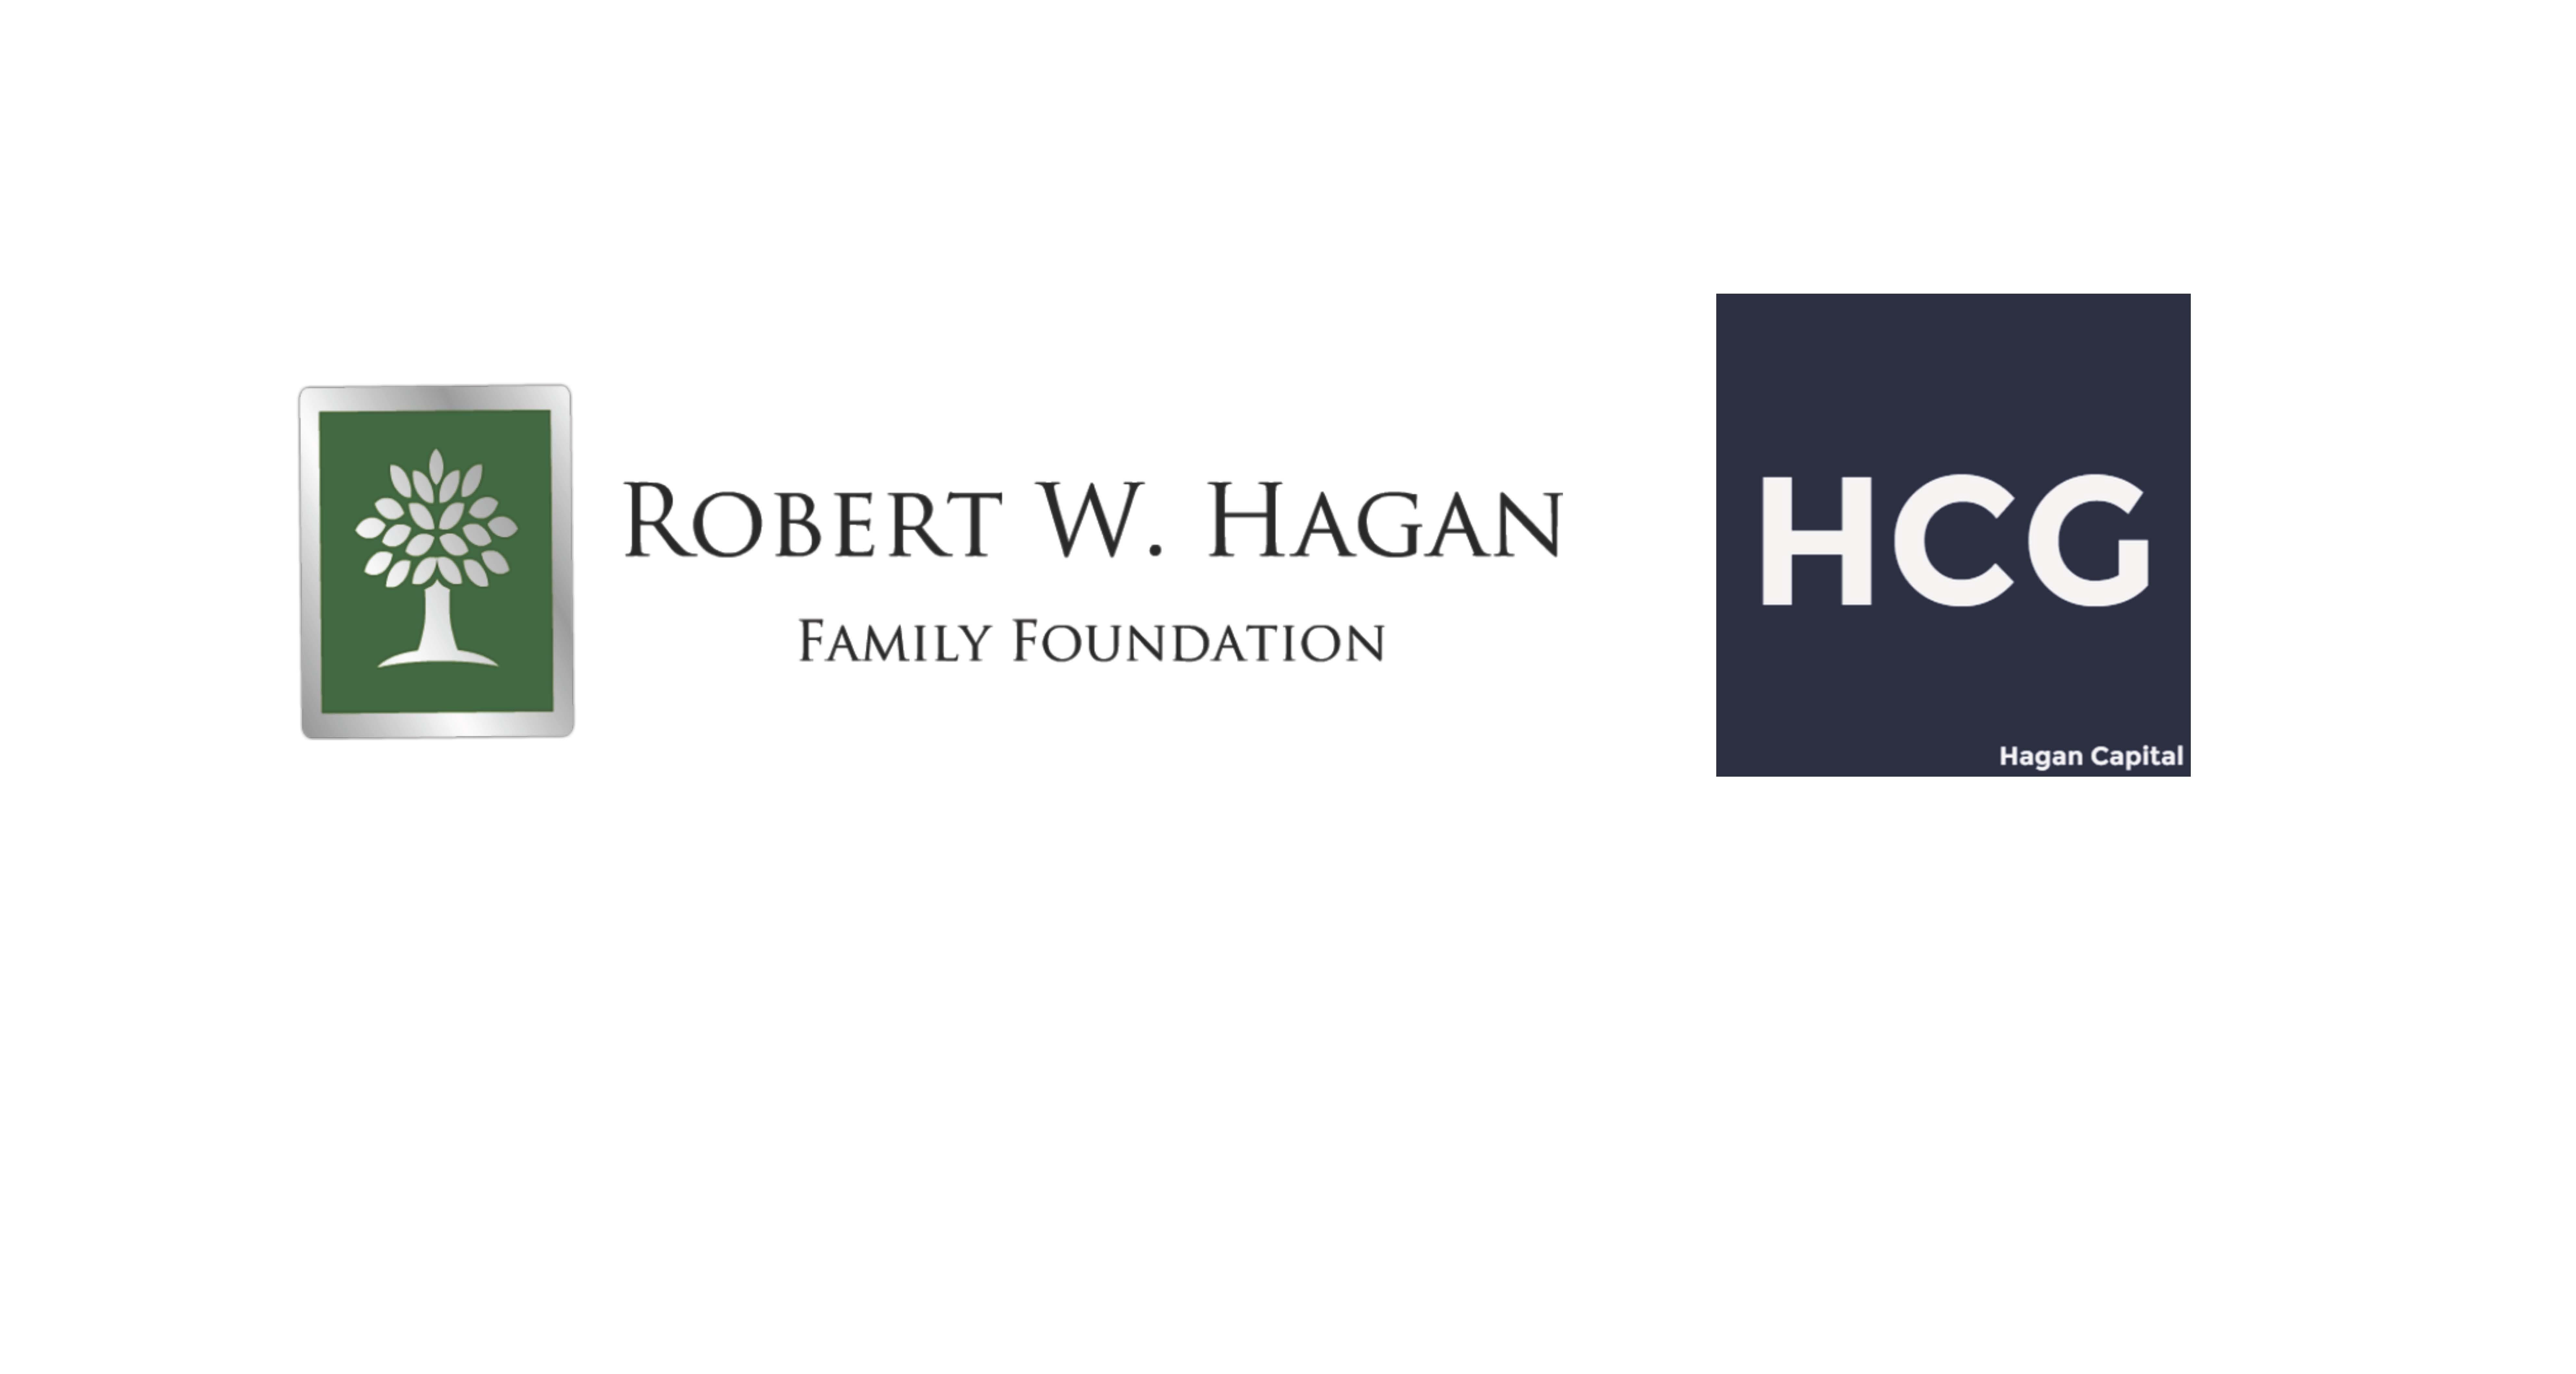 The Robert W. Hagan Family Foundation and Hagan Capital